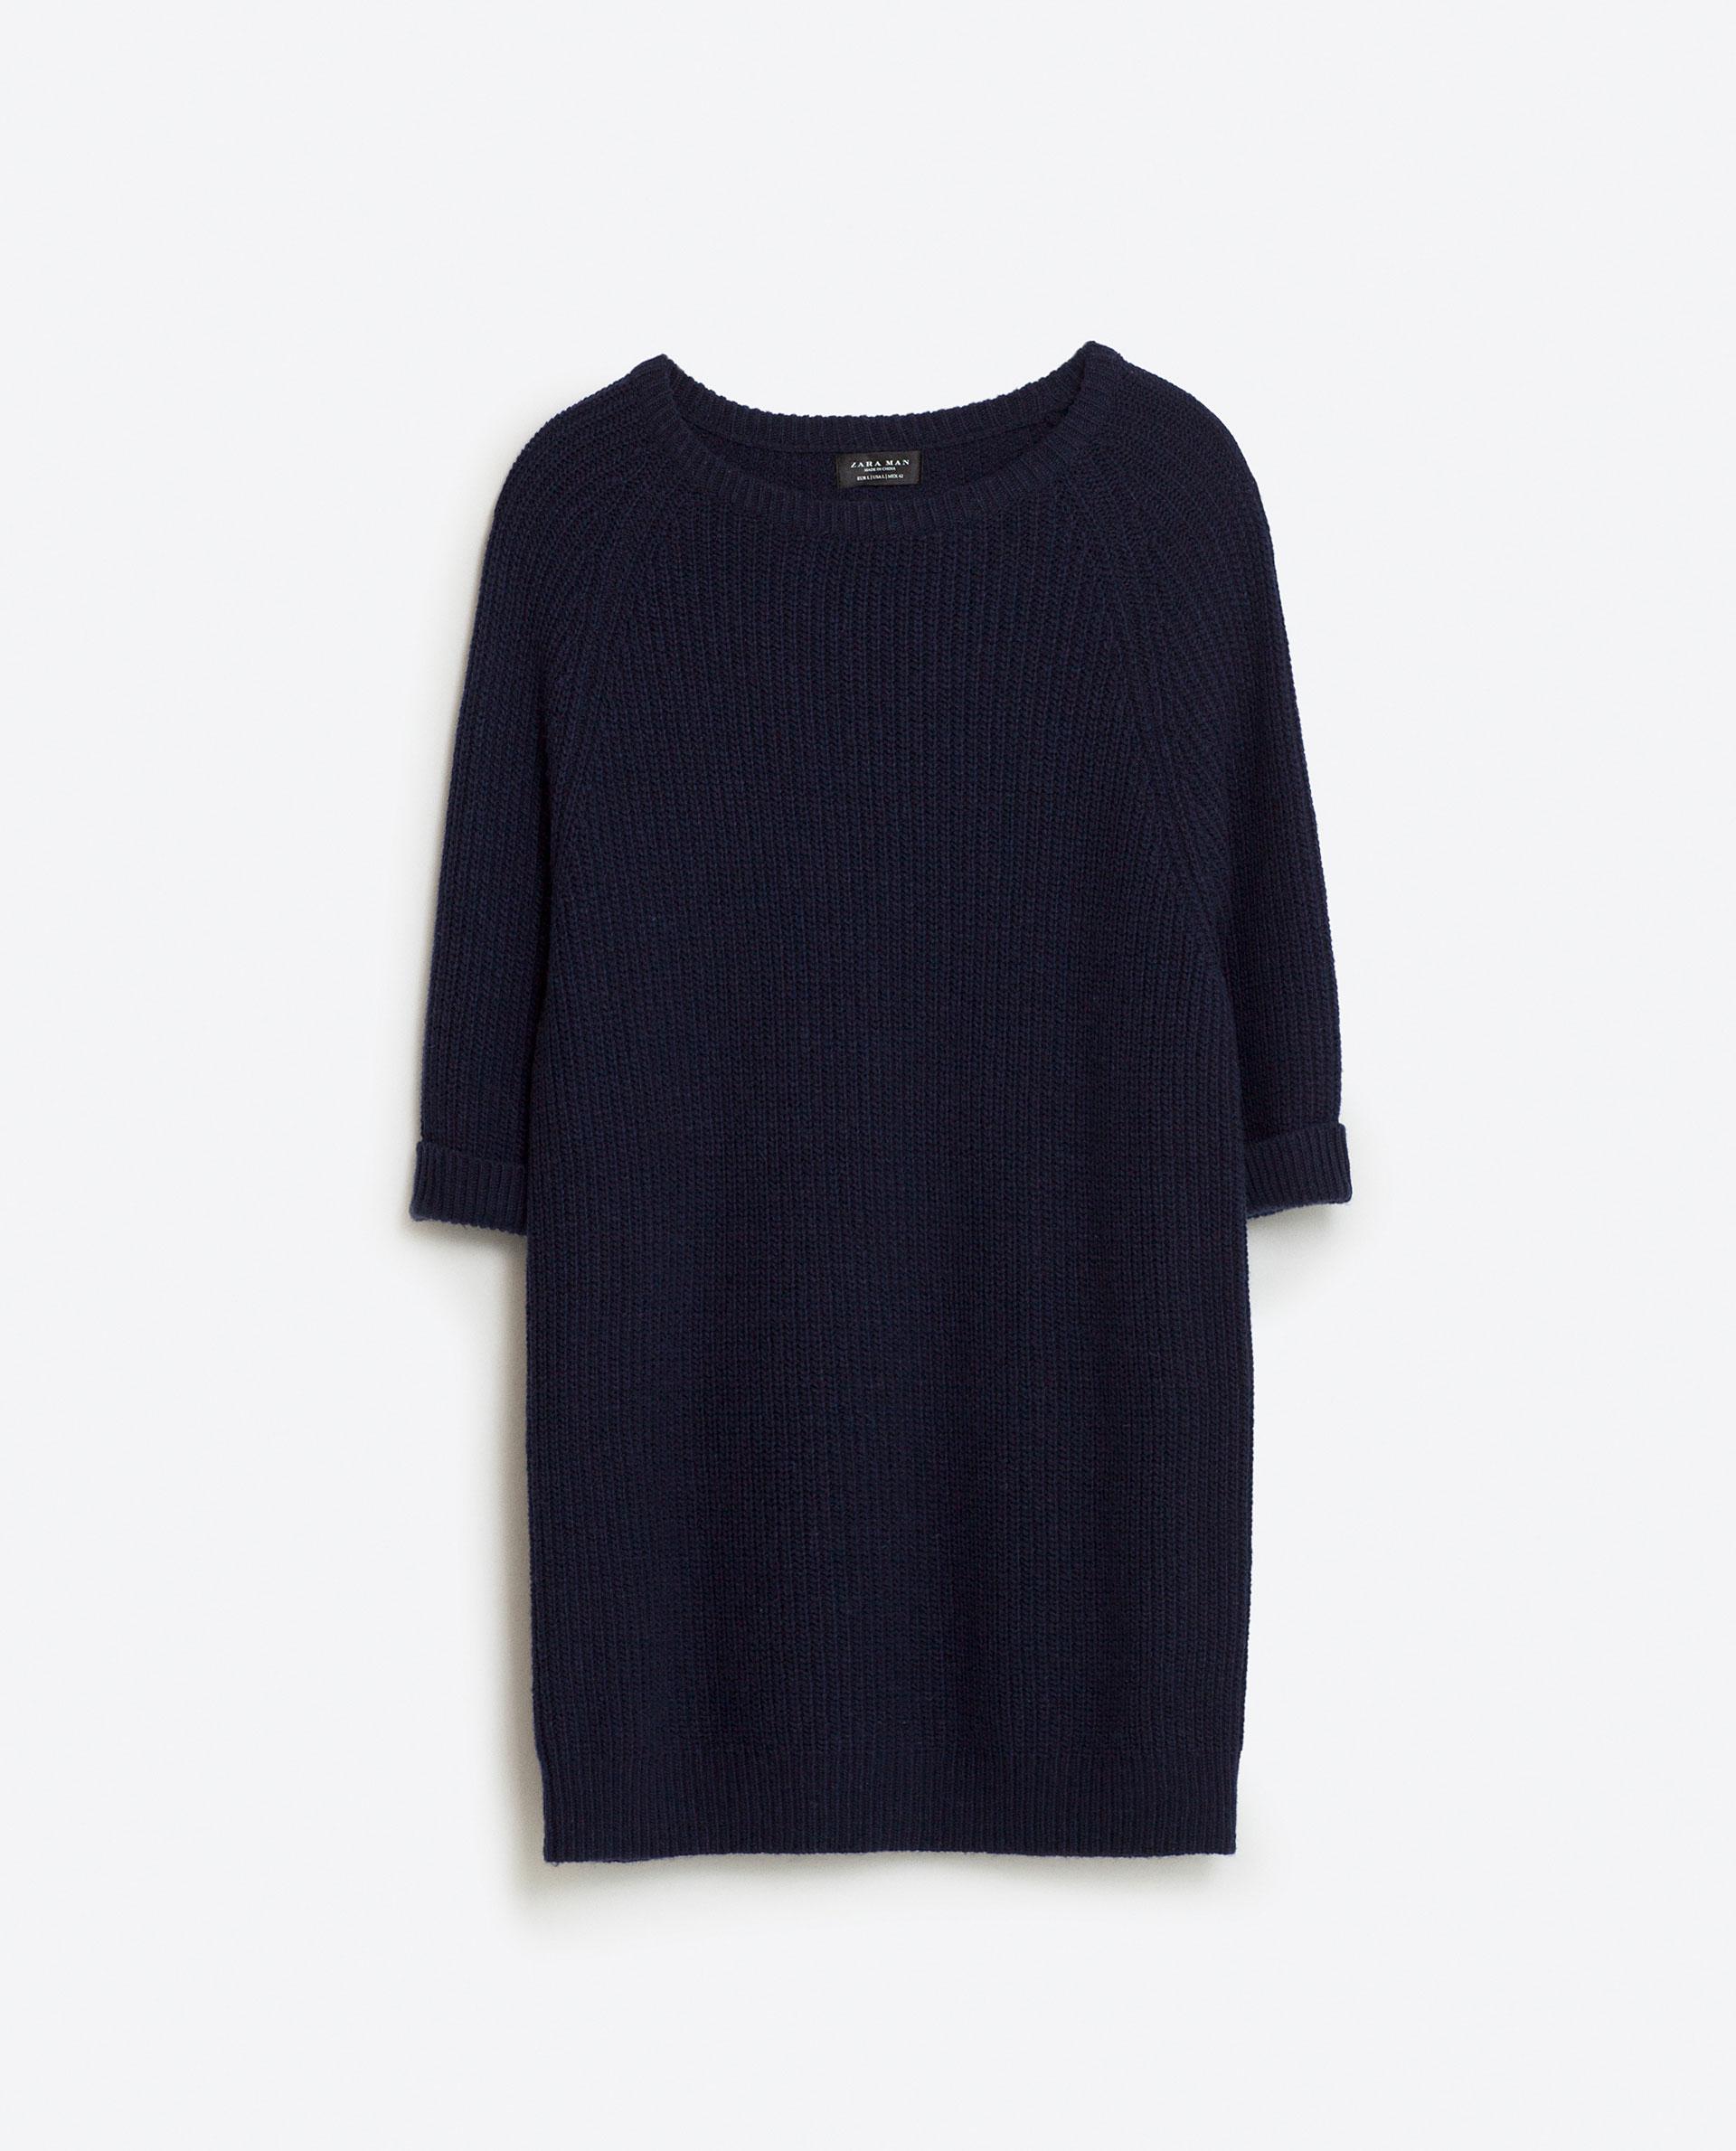 Short-sleeve sweater, £25.99 ( zara.com )